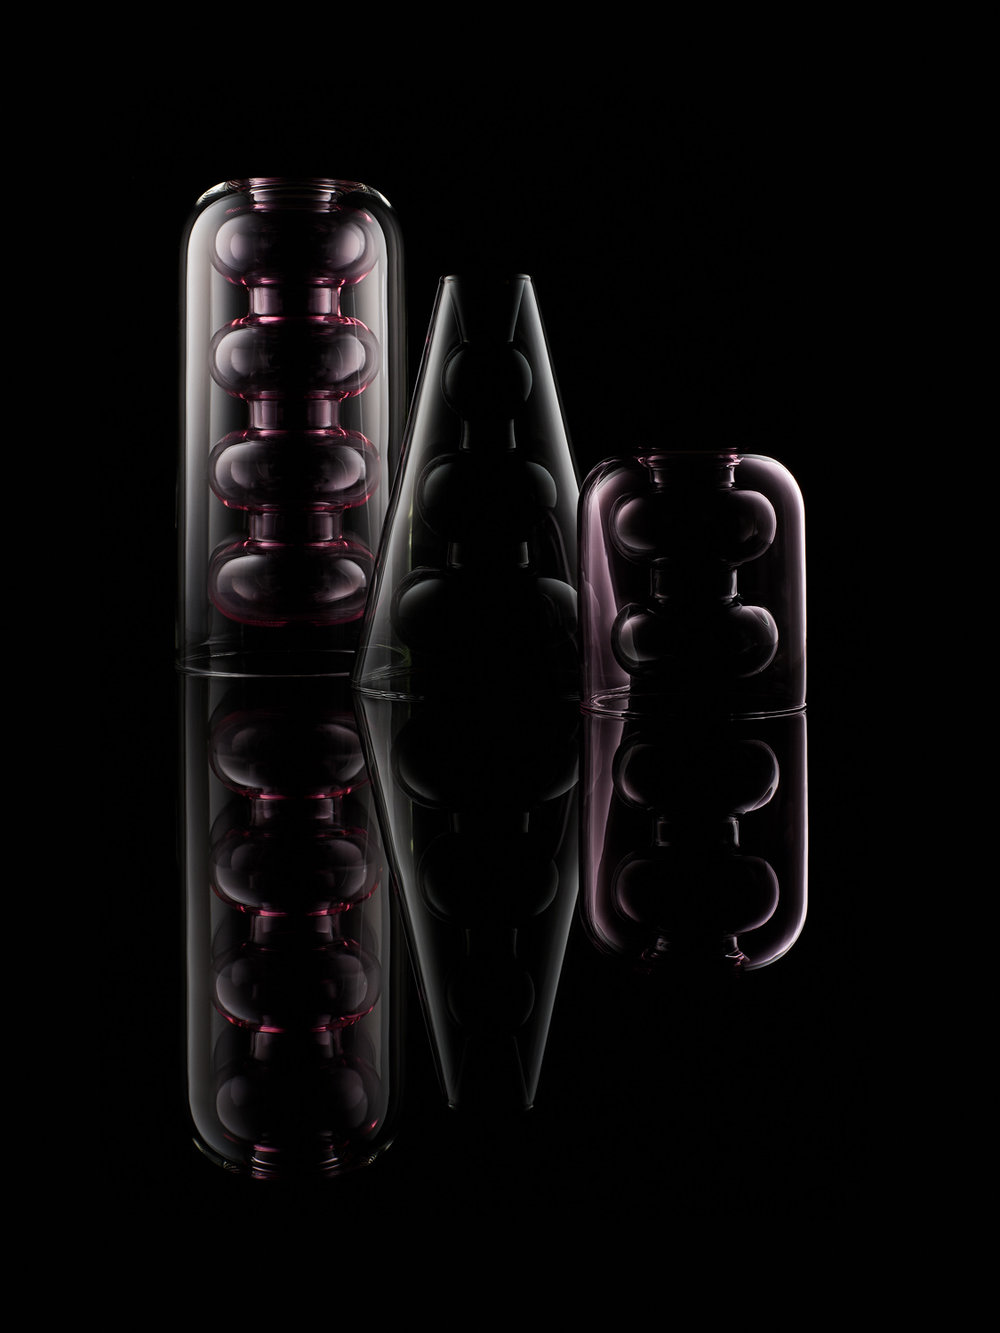 20170920 Tom Dixon Vases-107677 v3.jpg